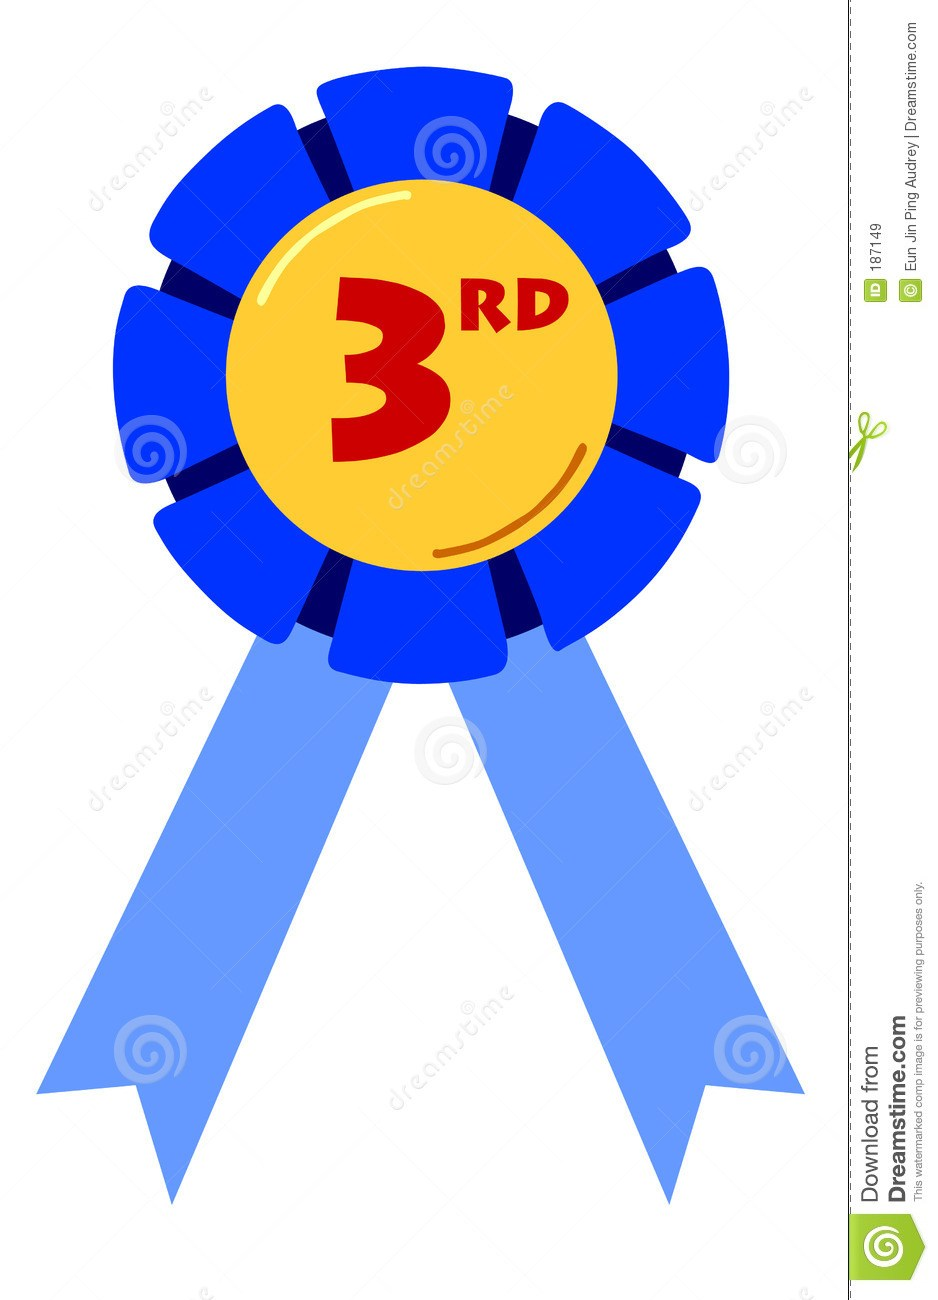 3rd place ribbon clipart 4 » Clipart Portal.